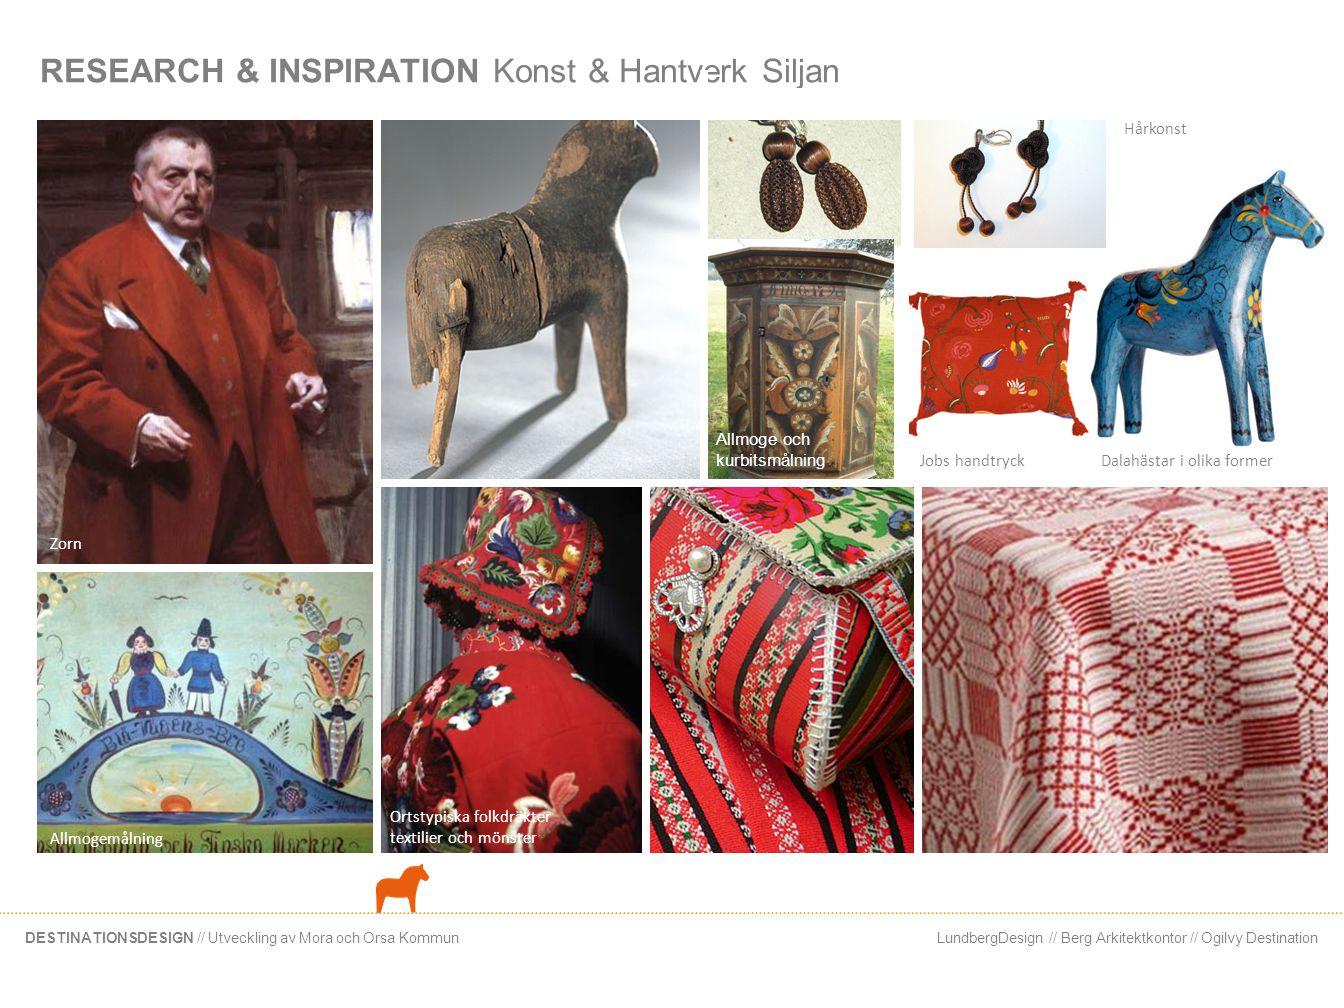 RESEARCH & INSPIRATION Konst & Hantverk Siljan